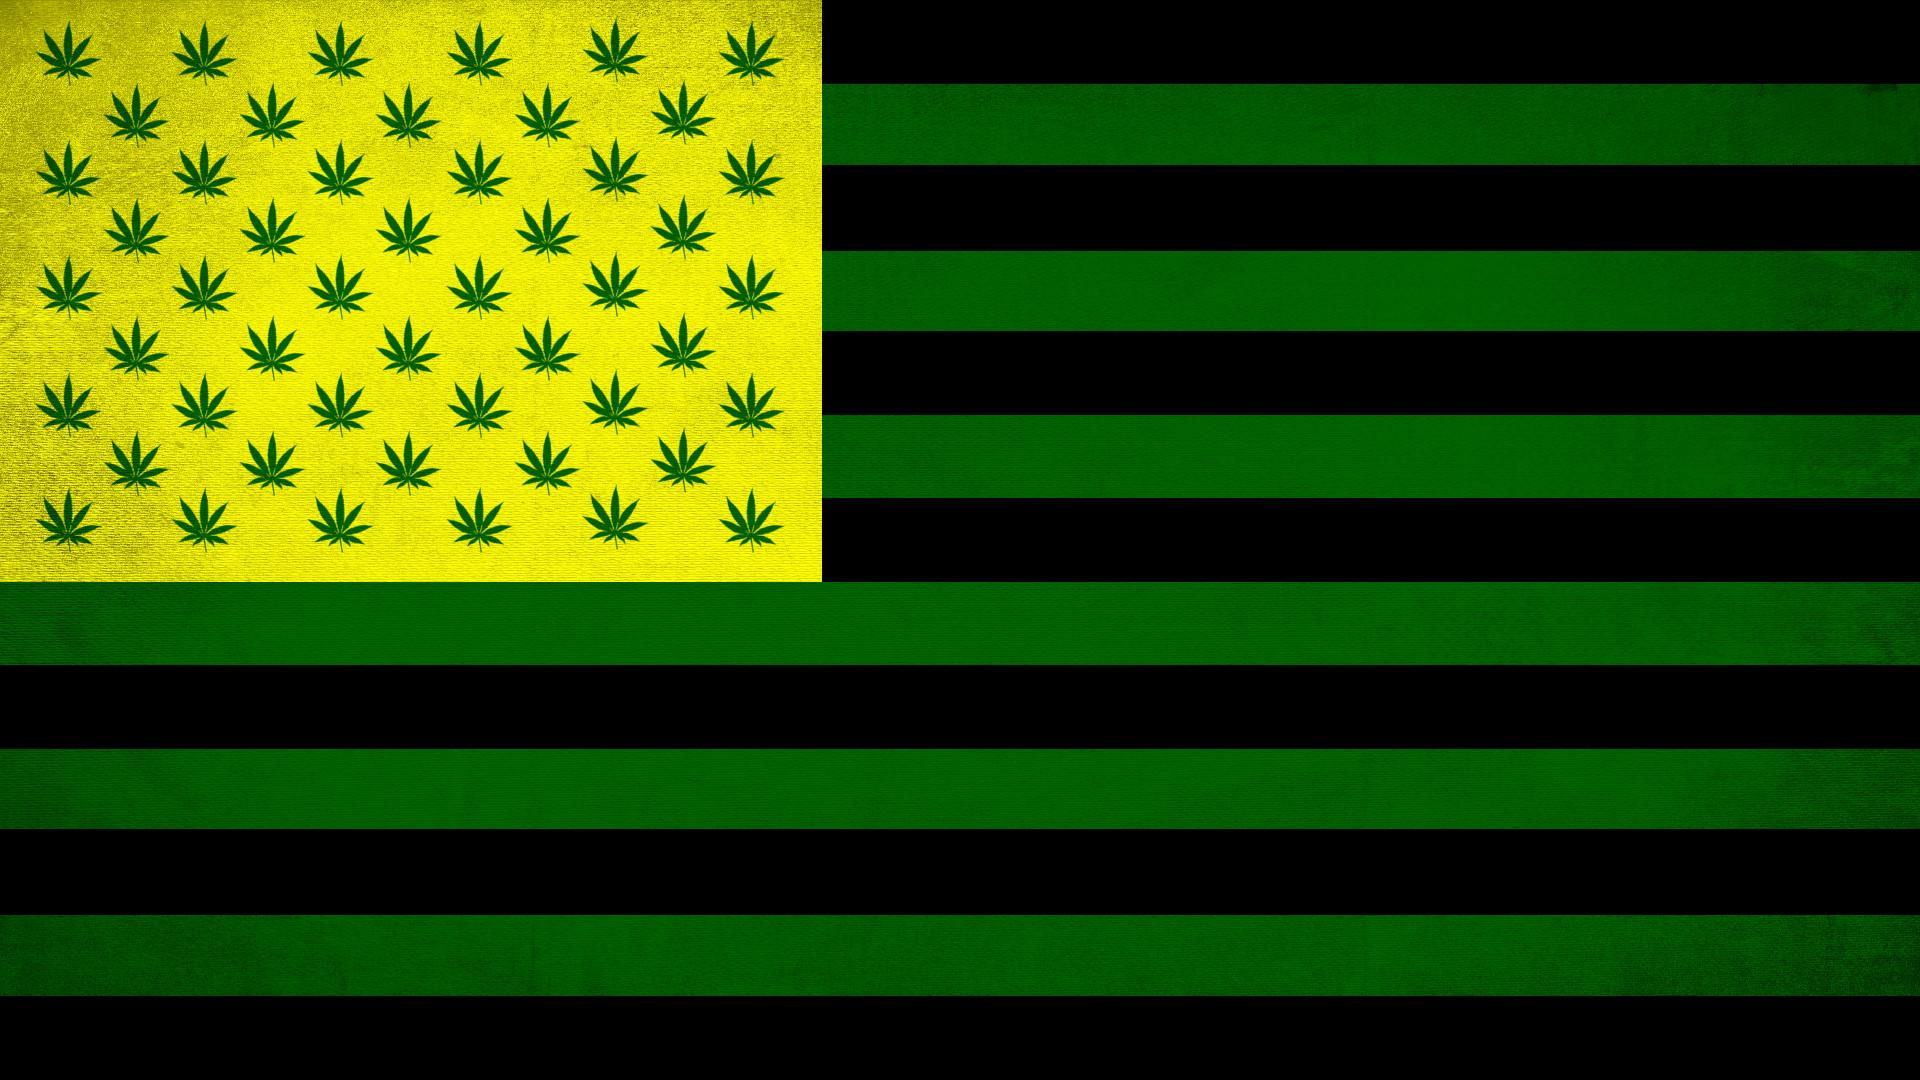 Cannabis Nation Flag by MetoAshoto